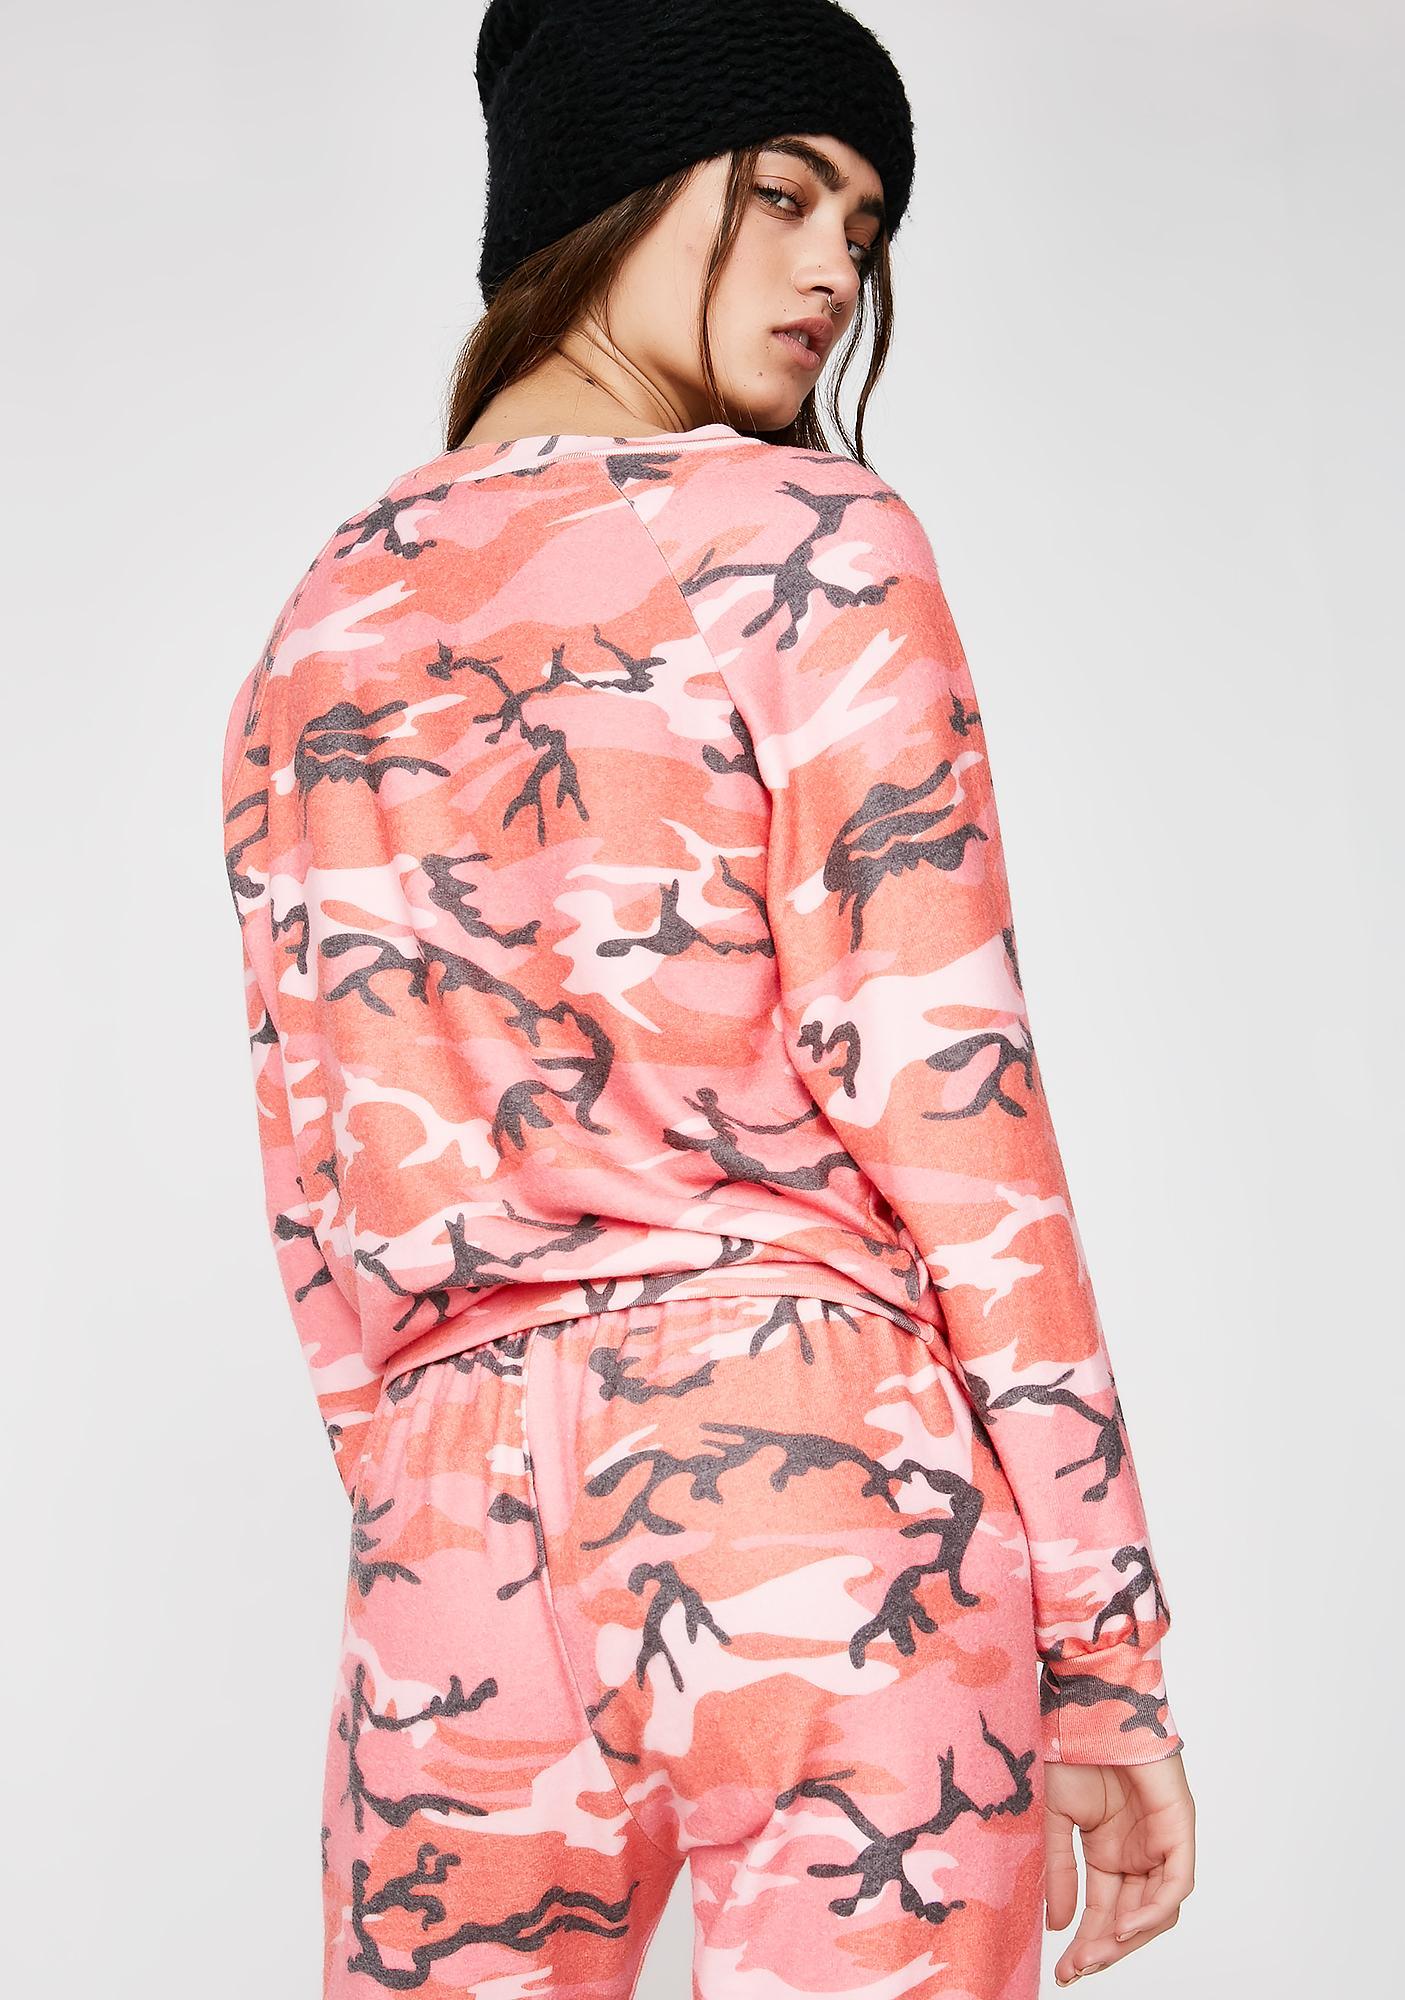 Wildfox Couture Fire Camo Junior Sweatshirt